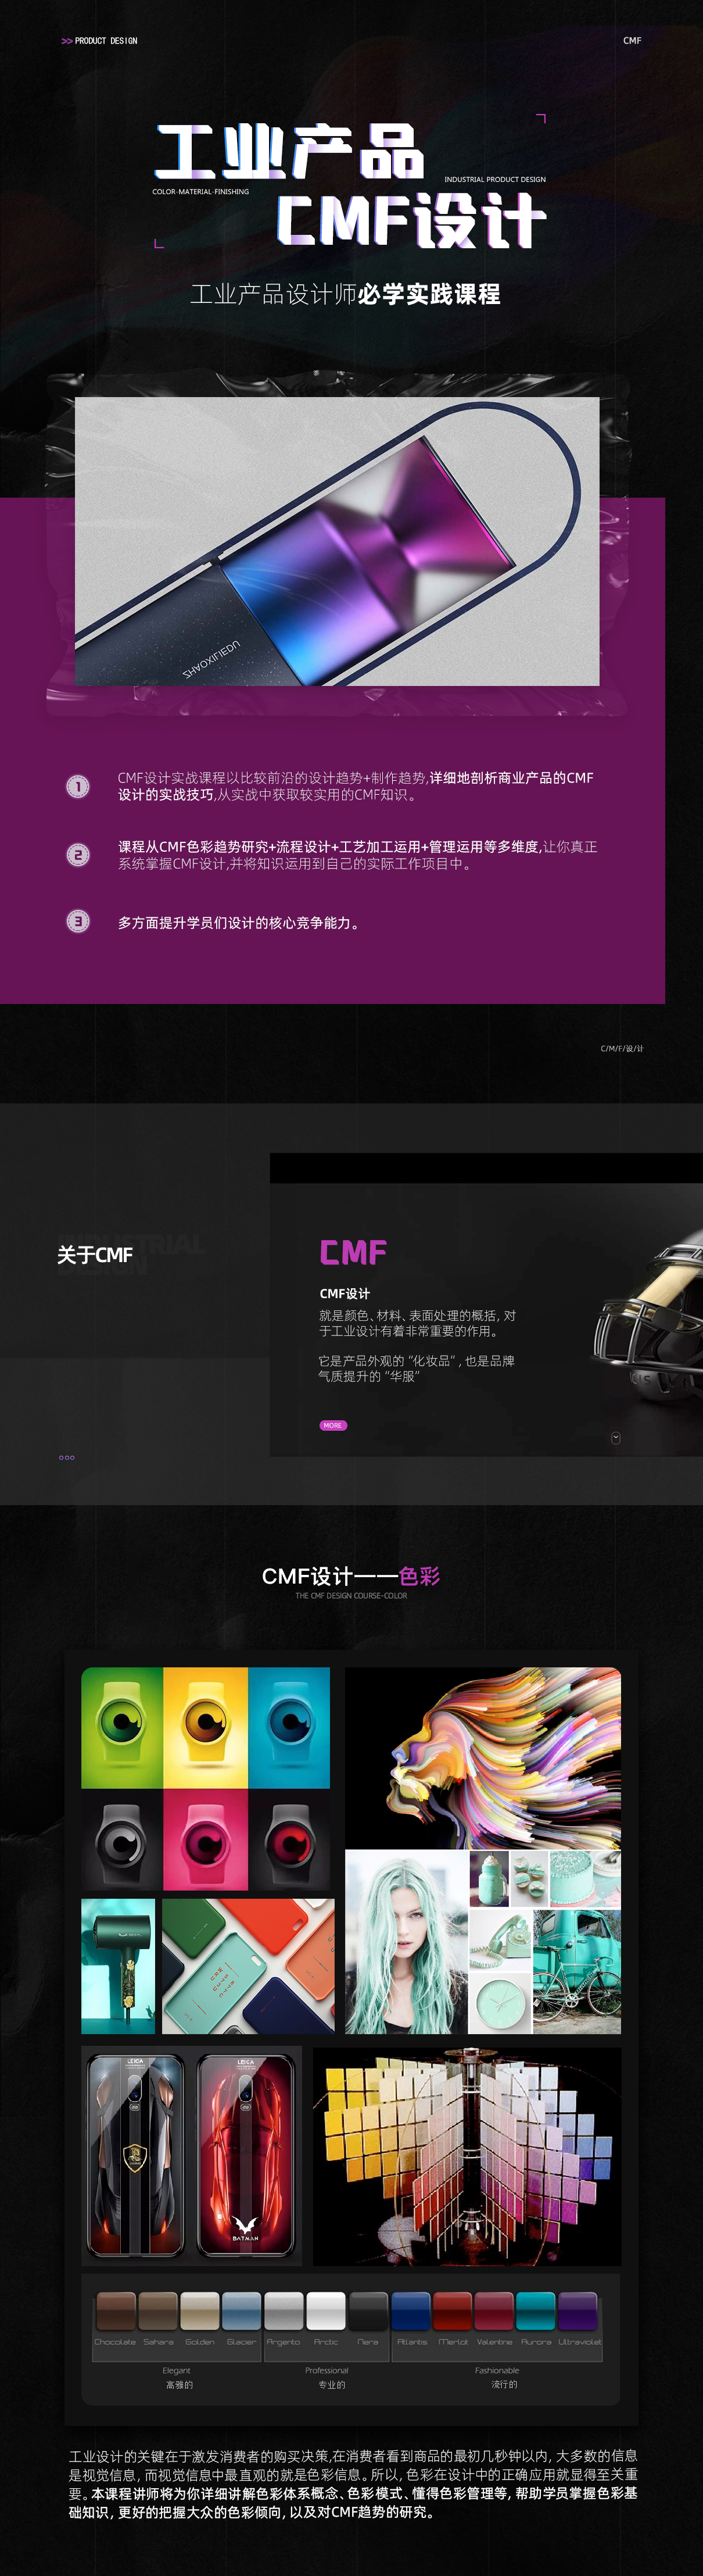 cmf产品设计详情页_01.jpg